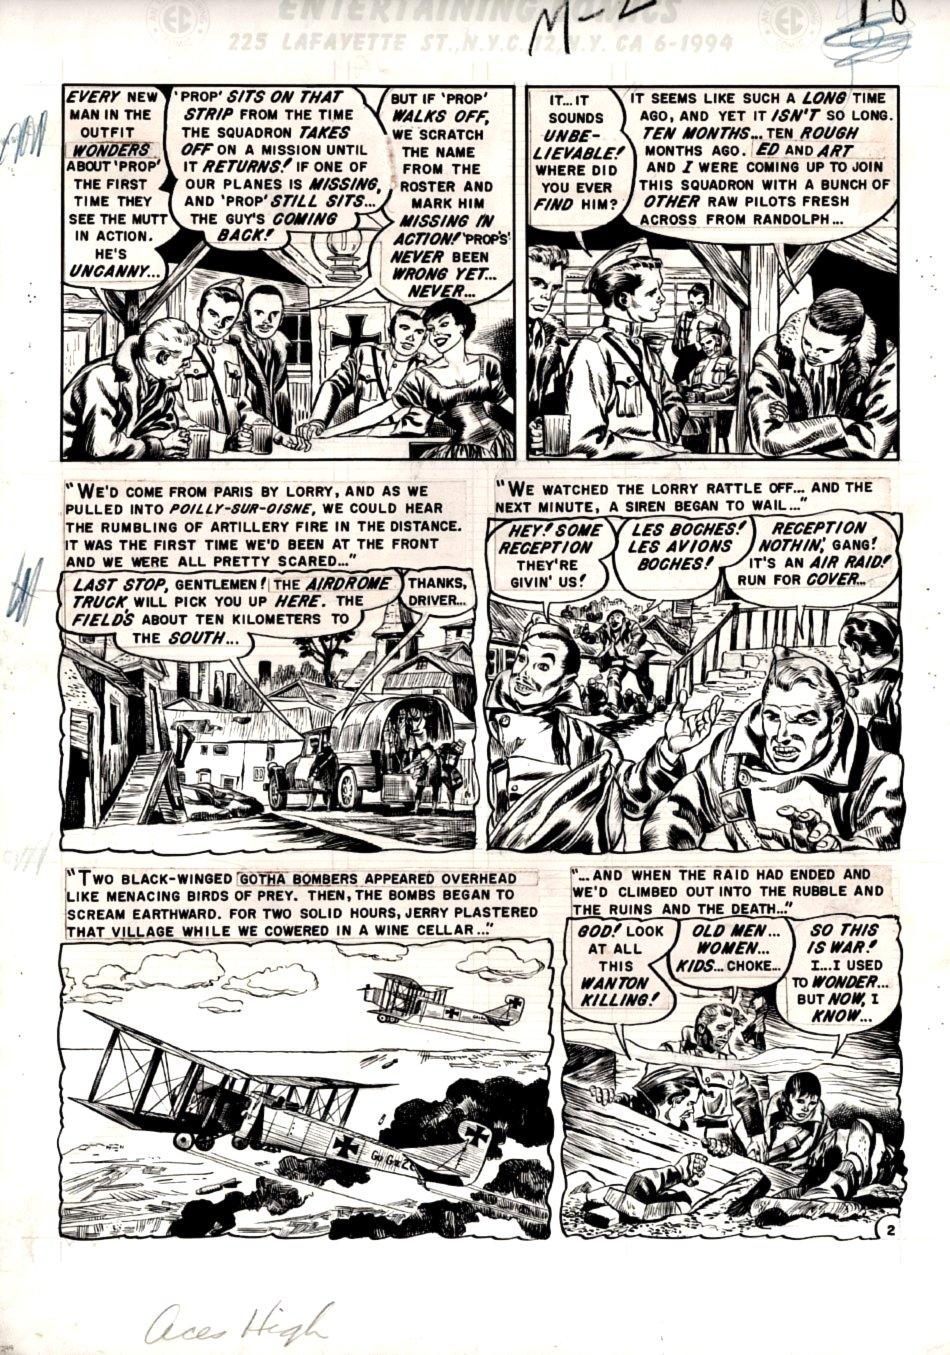 Aces High #1 p 2 (Large Art) 1954